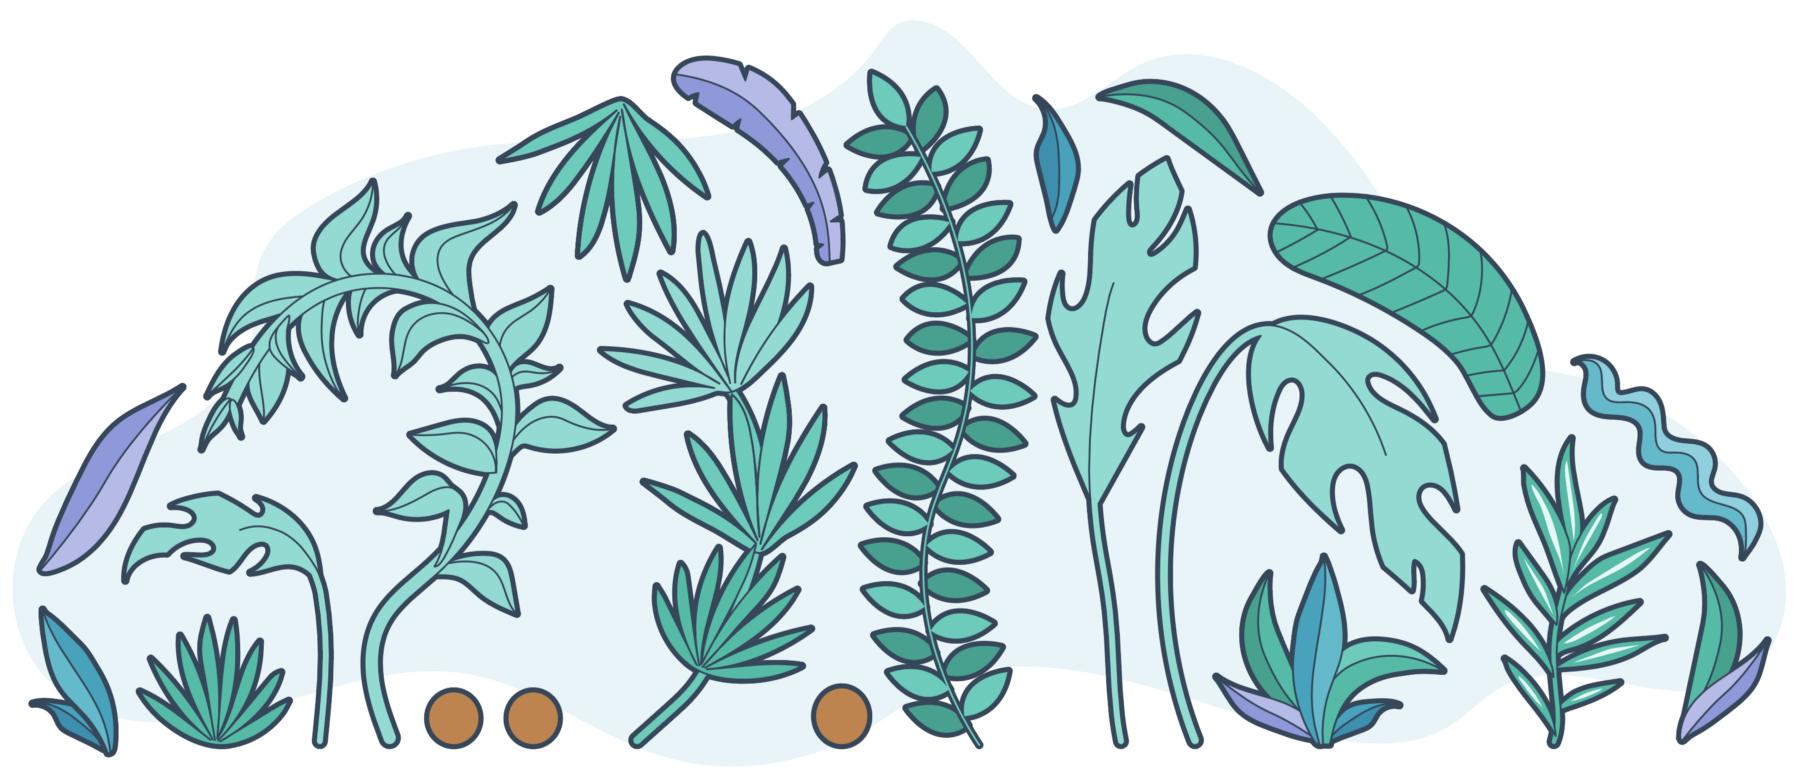 organizeplants.png